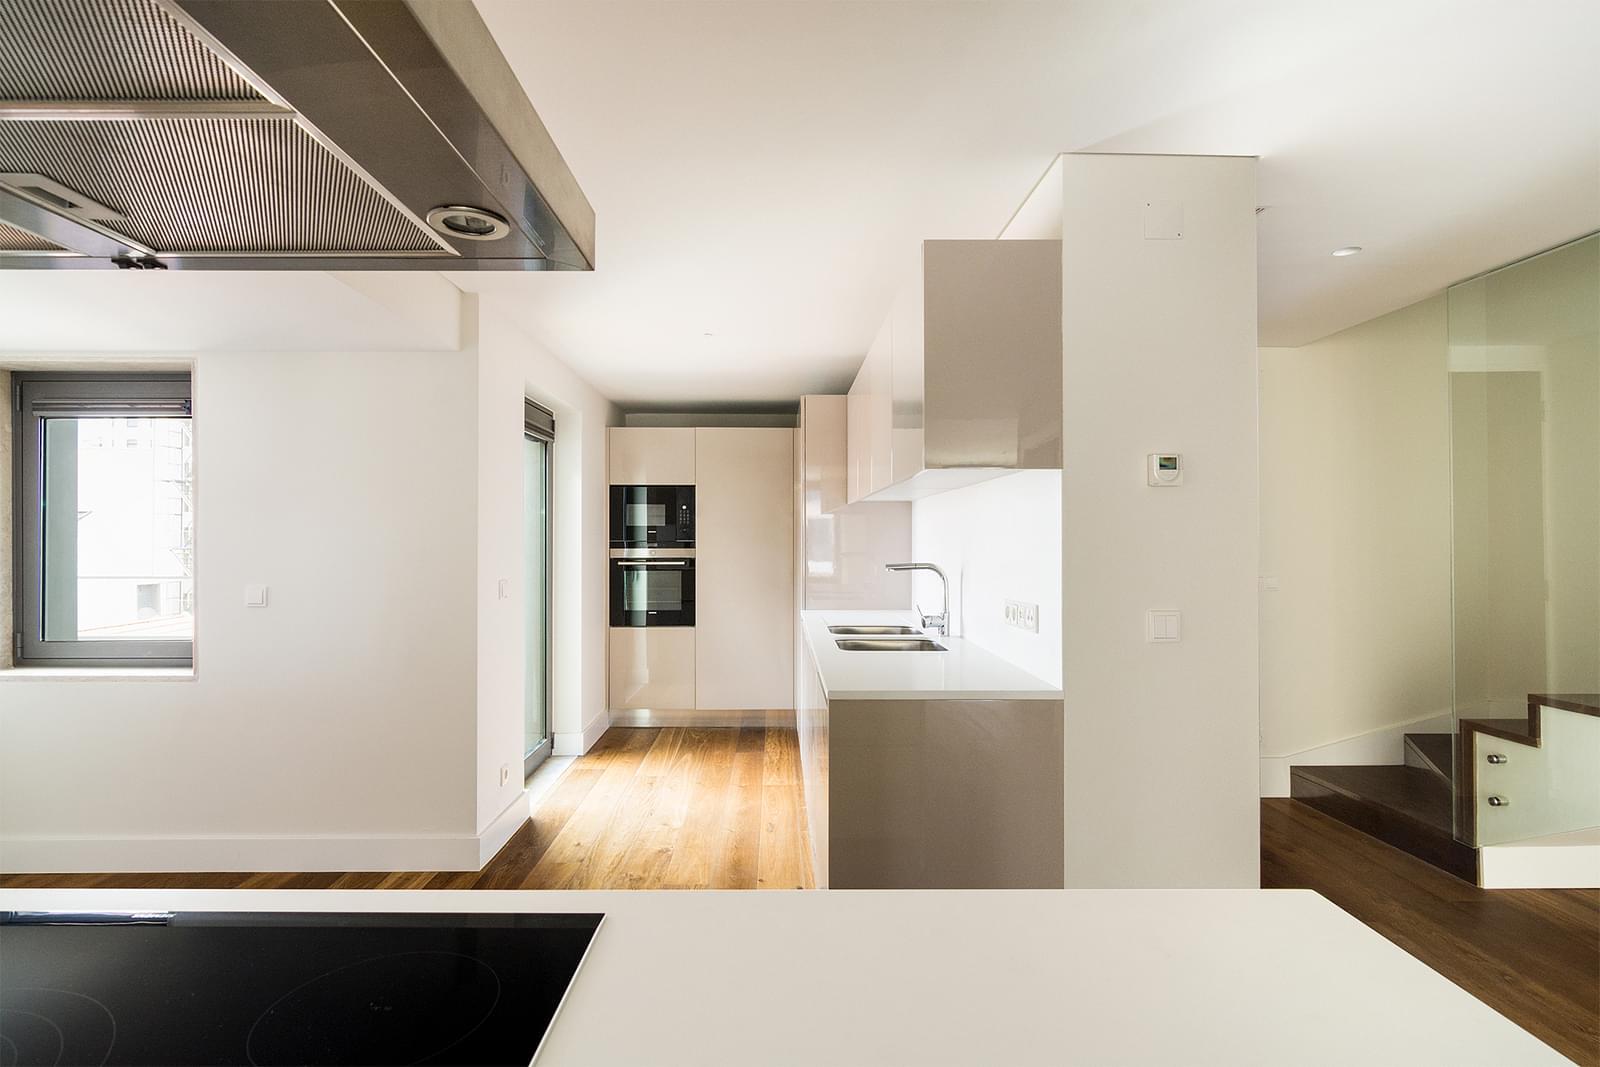 pf17442-apartamento-t3-lisboa-710ce18a-7908-4b77-aa1e-bd683bd88dfe